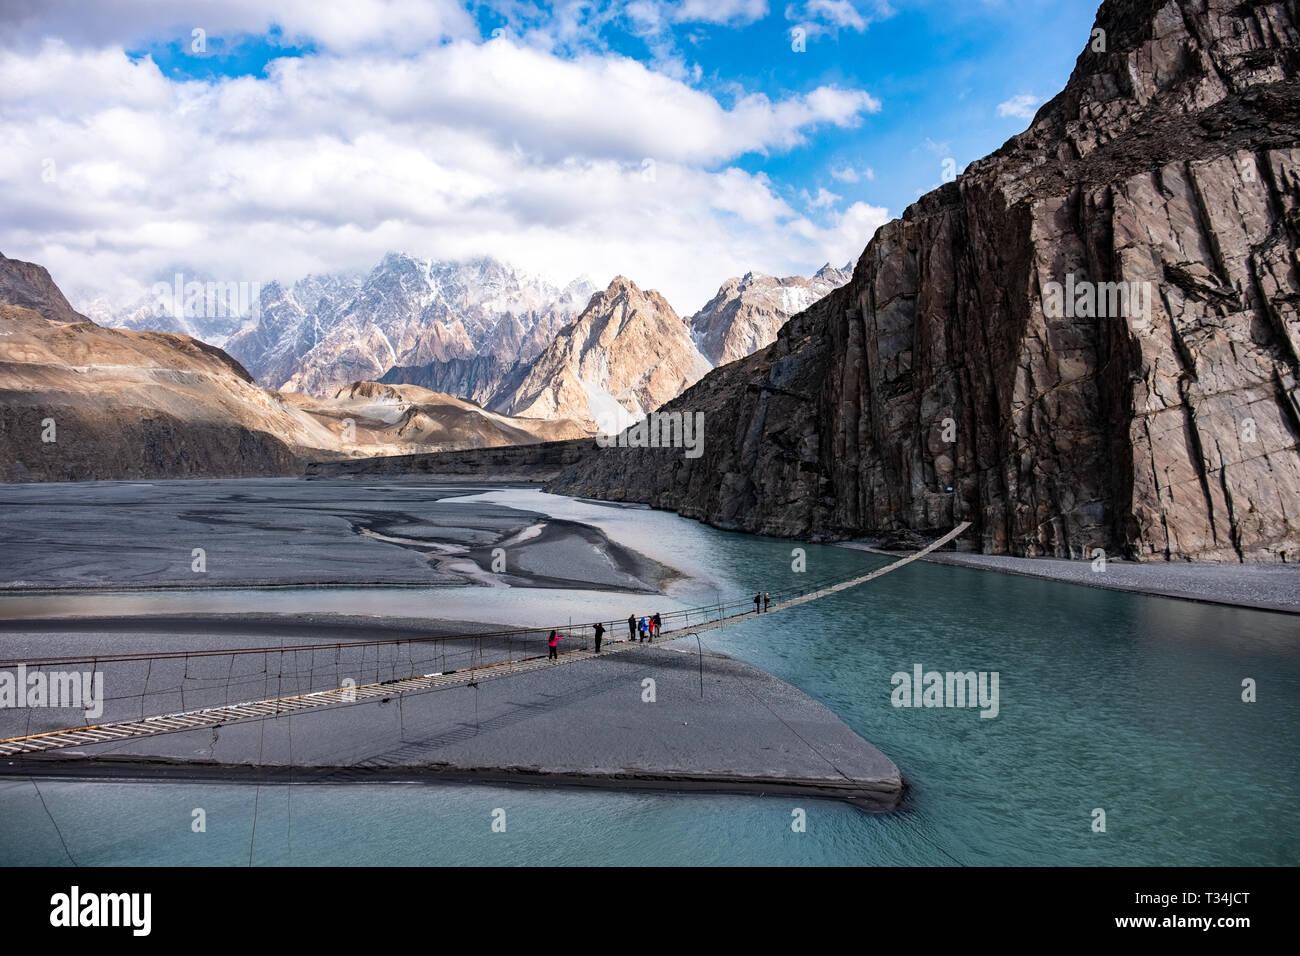 People crossing the Hussaini Hanging Bridge, Hunza, Gilgit-Baltistan, Pakistan - Stock Image